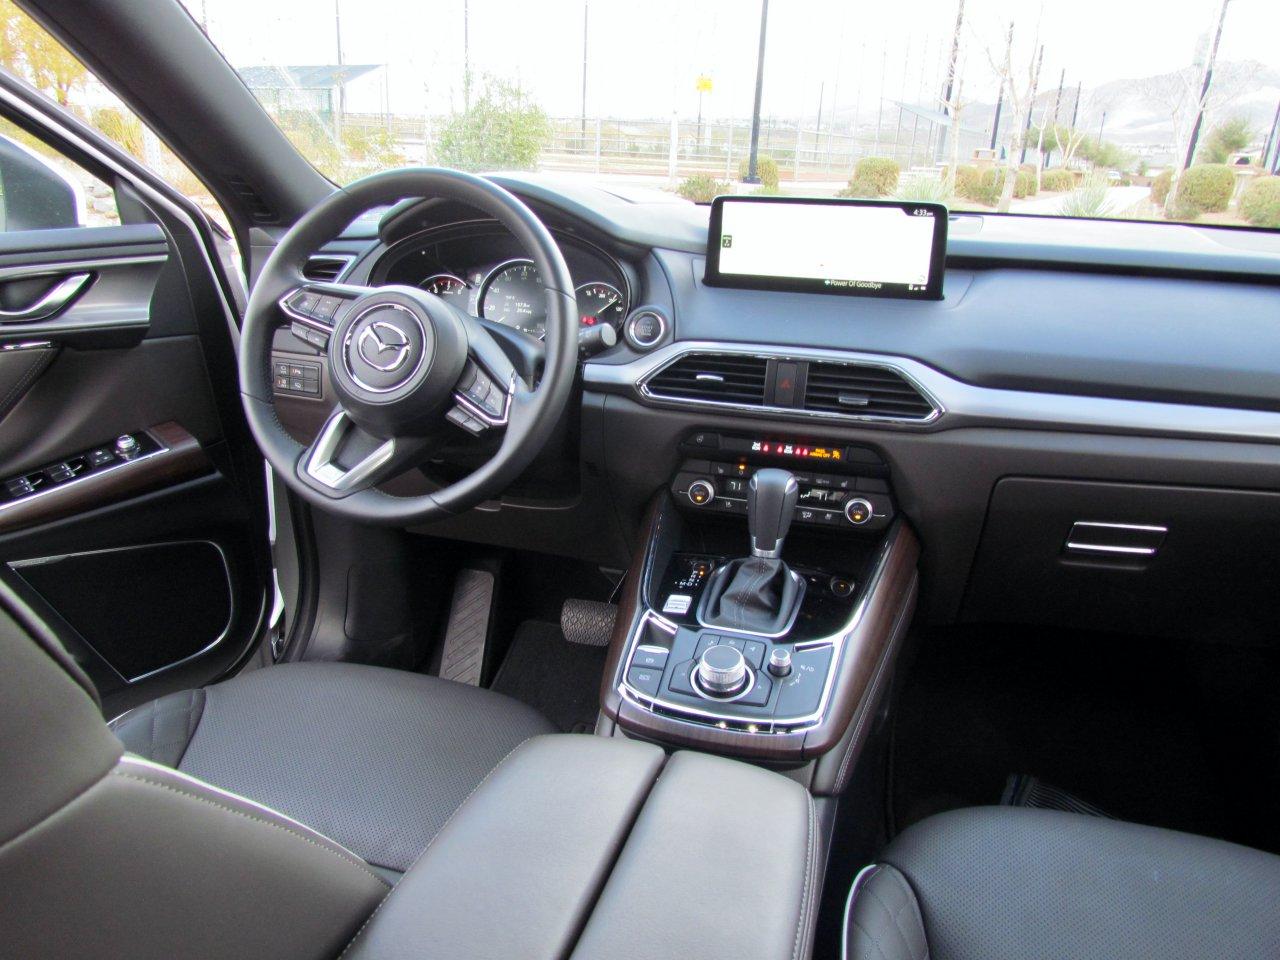 http://journal.classiccars.com/